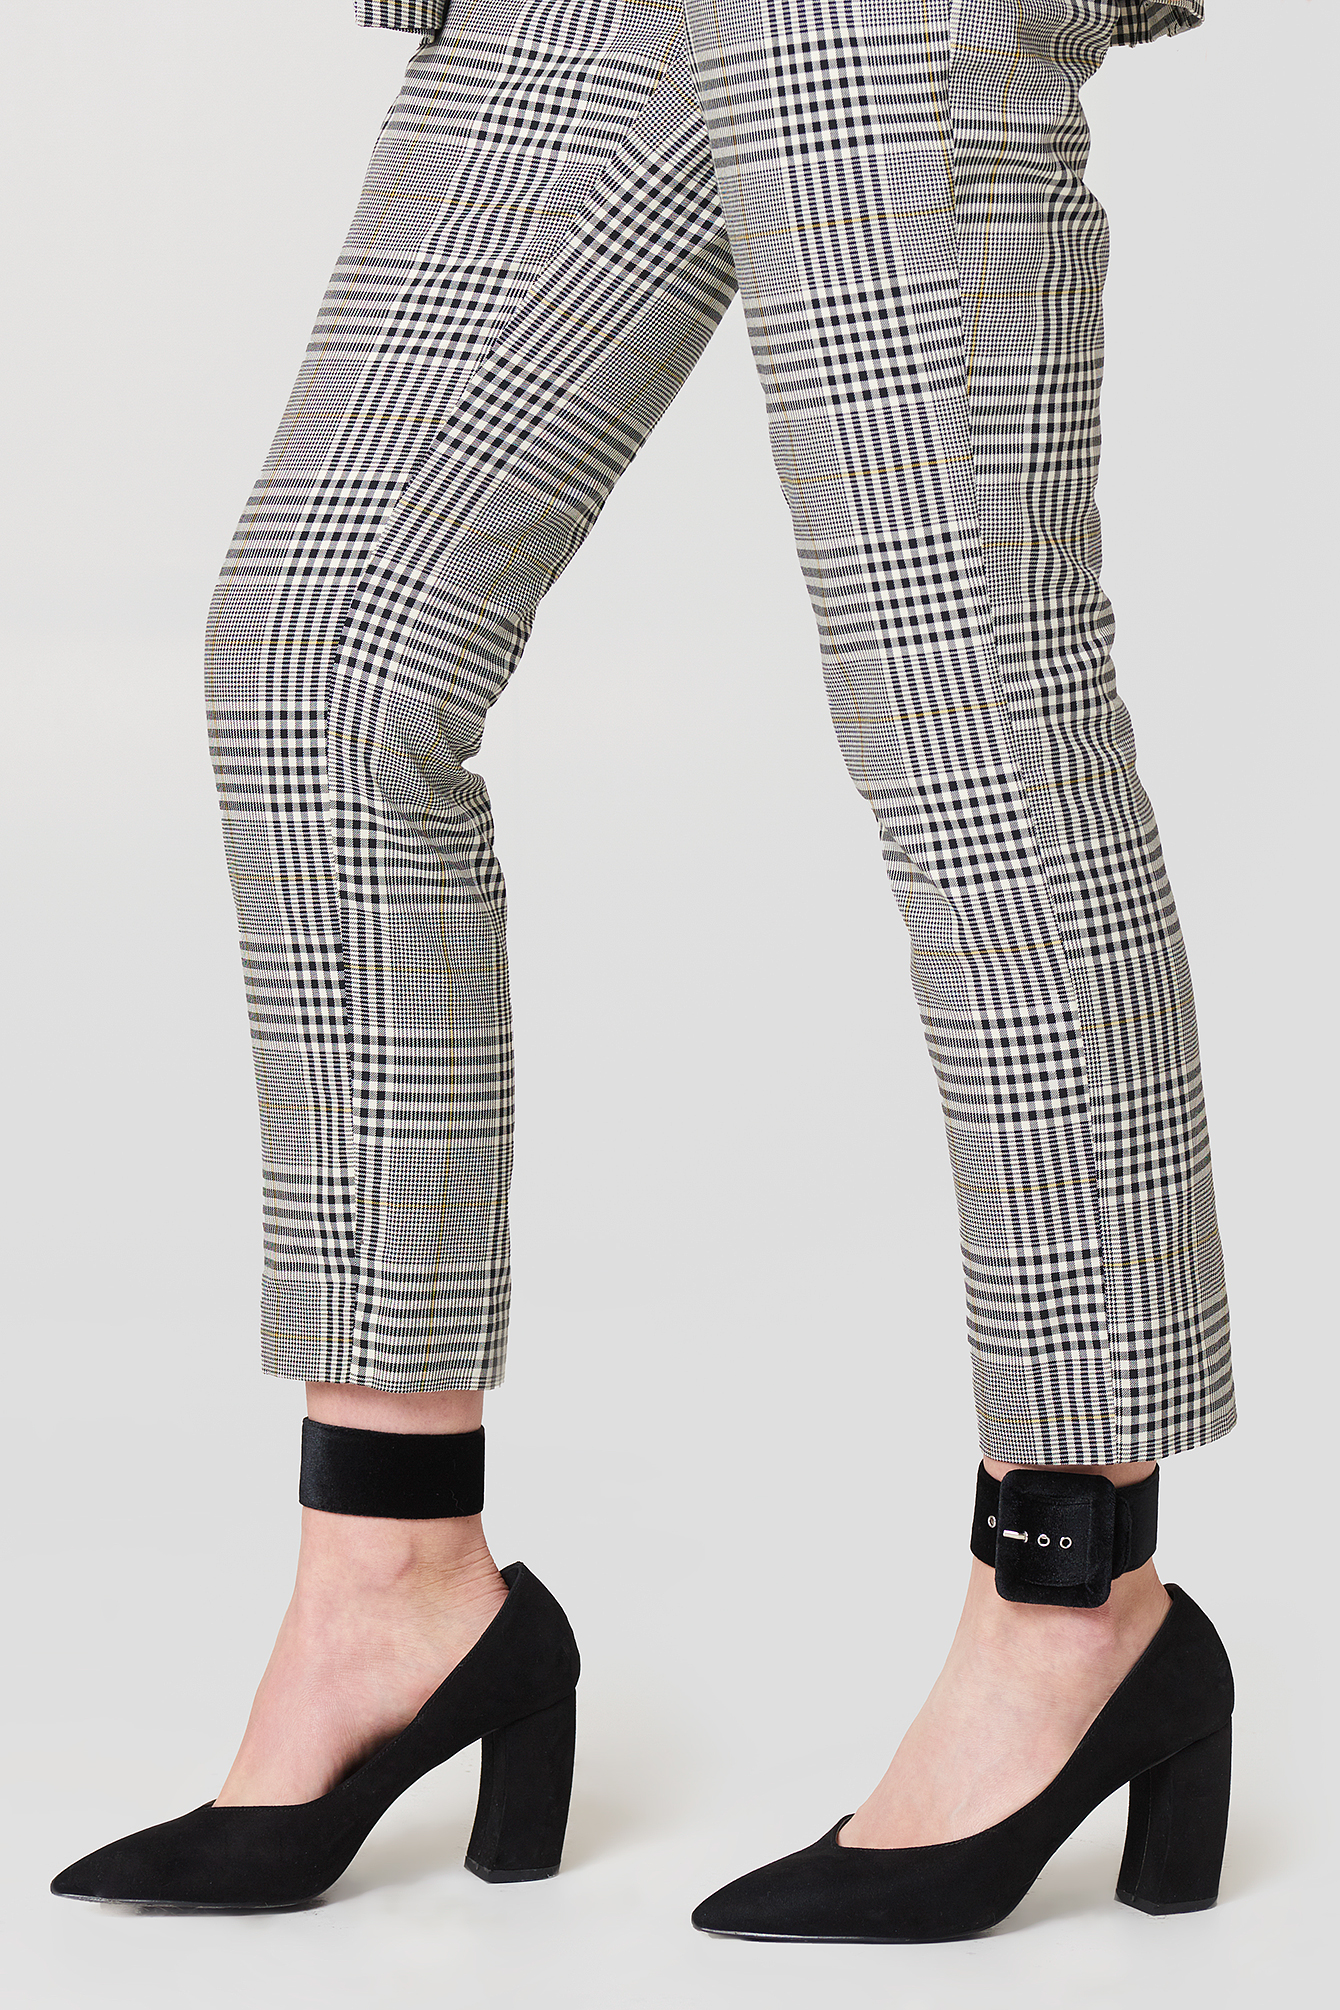 Velvet Ankle Cuffs NA-KD.COM